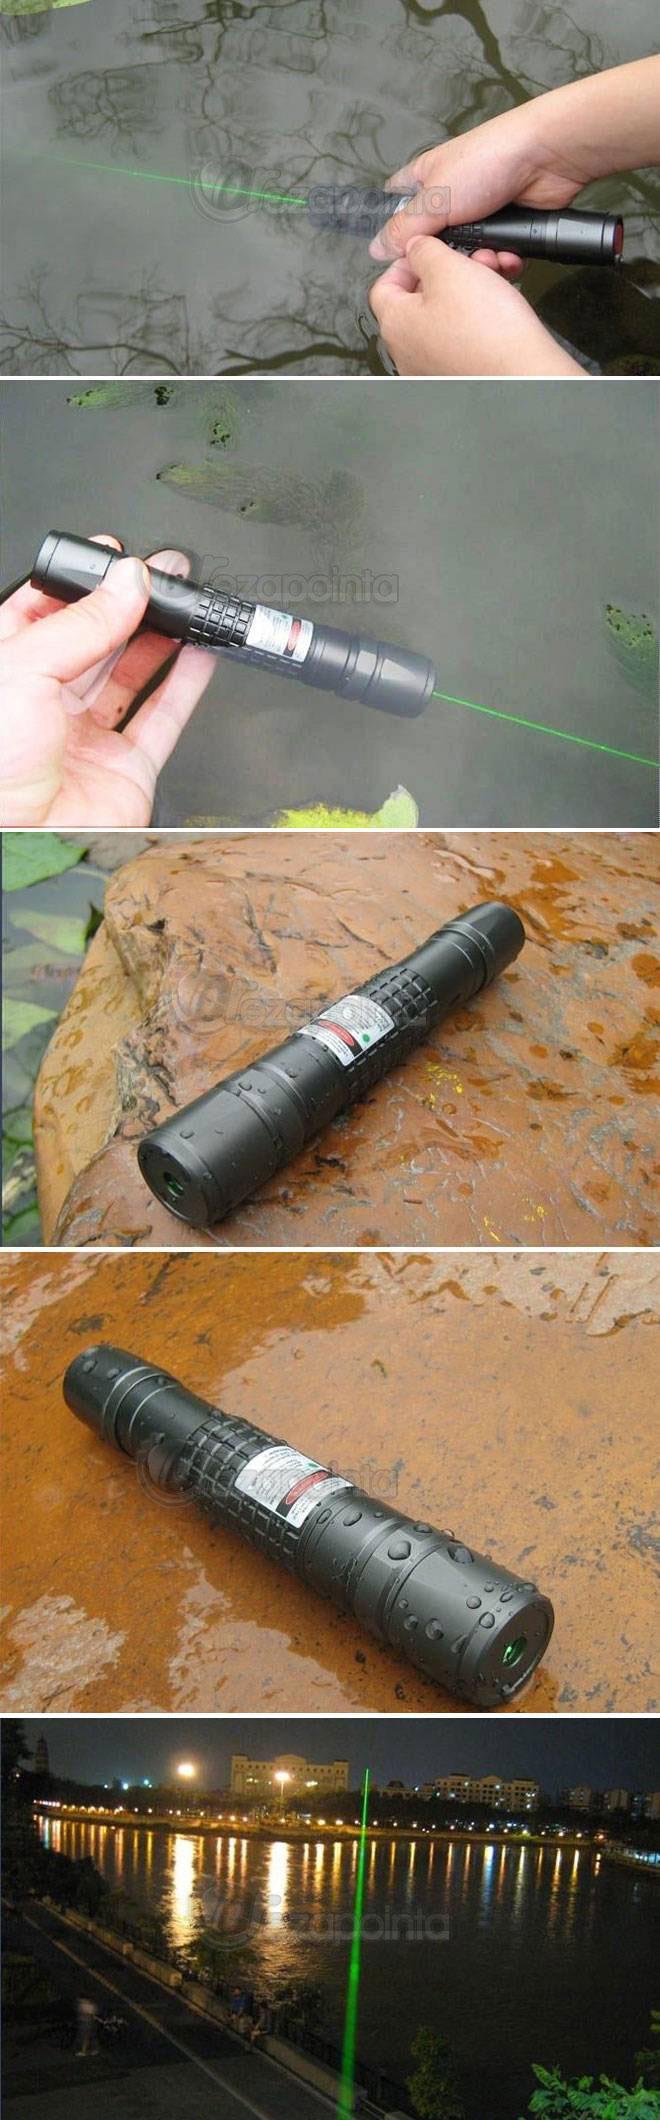 100mW 防水レーザーポインター グリーン